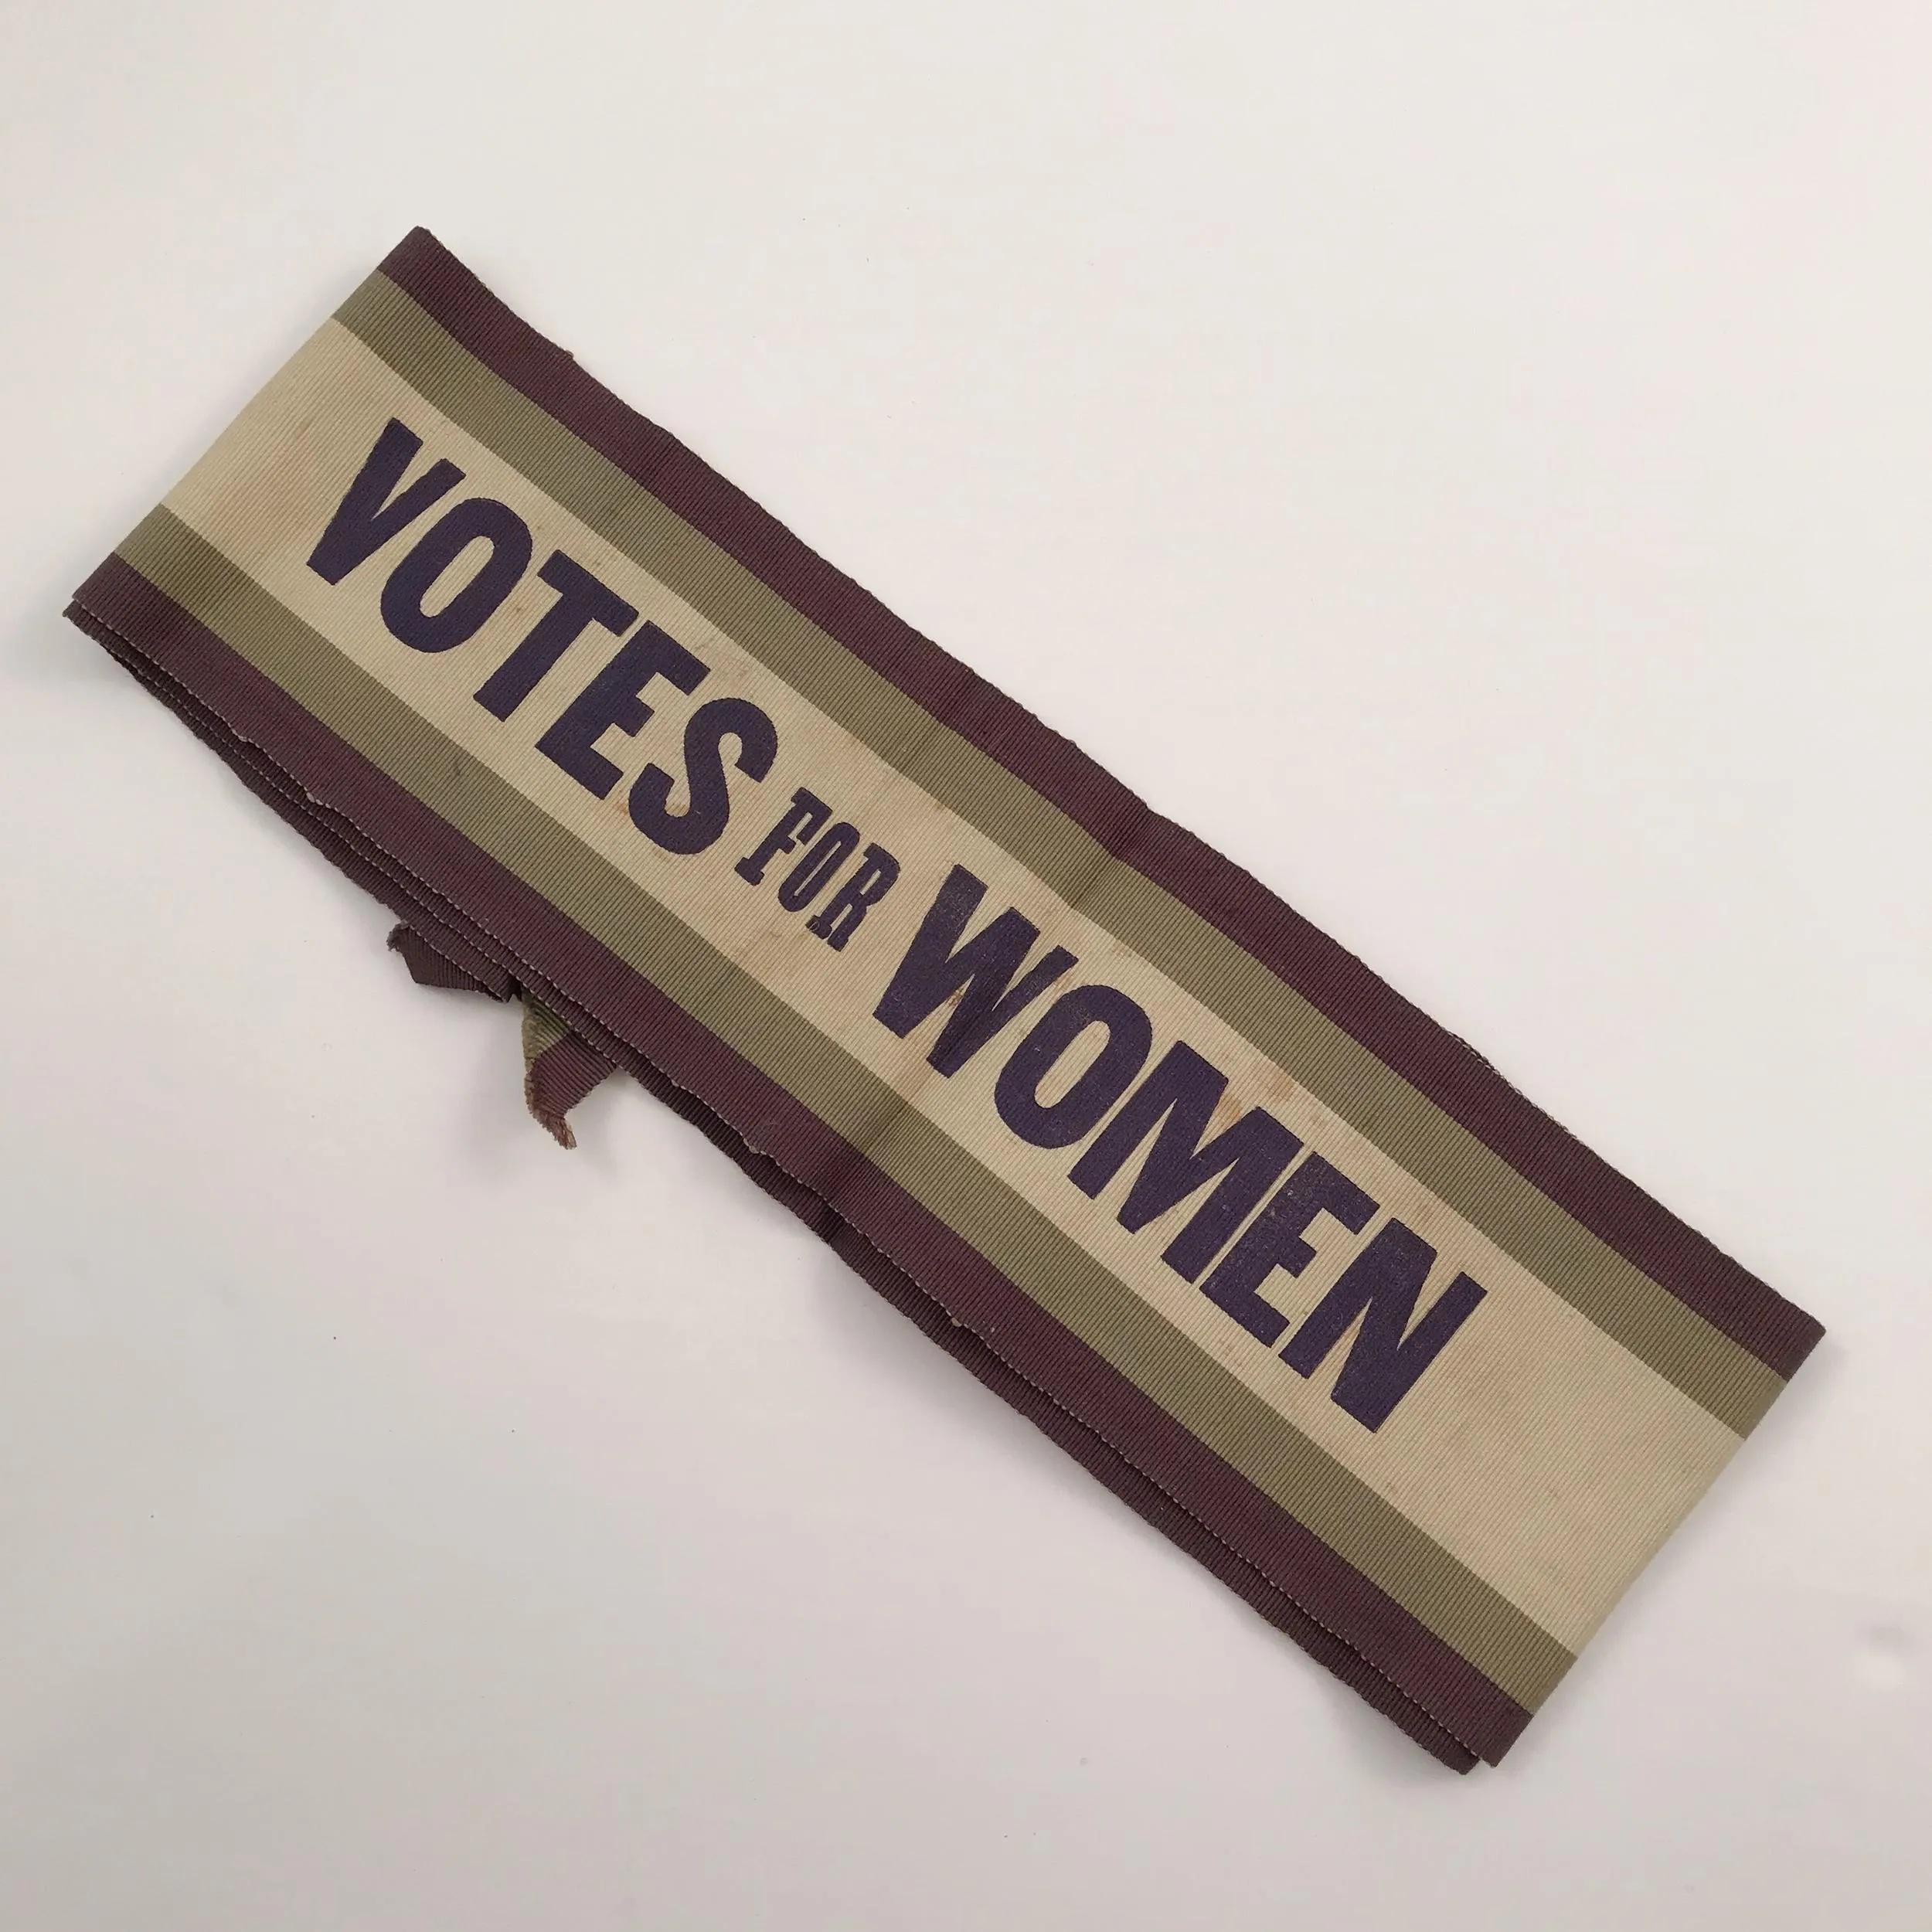 """Votes for Women"" cloth parade sash, $7,500. Image courtesy Fine Estate, Inc."